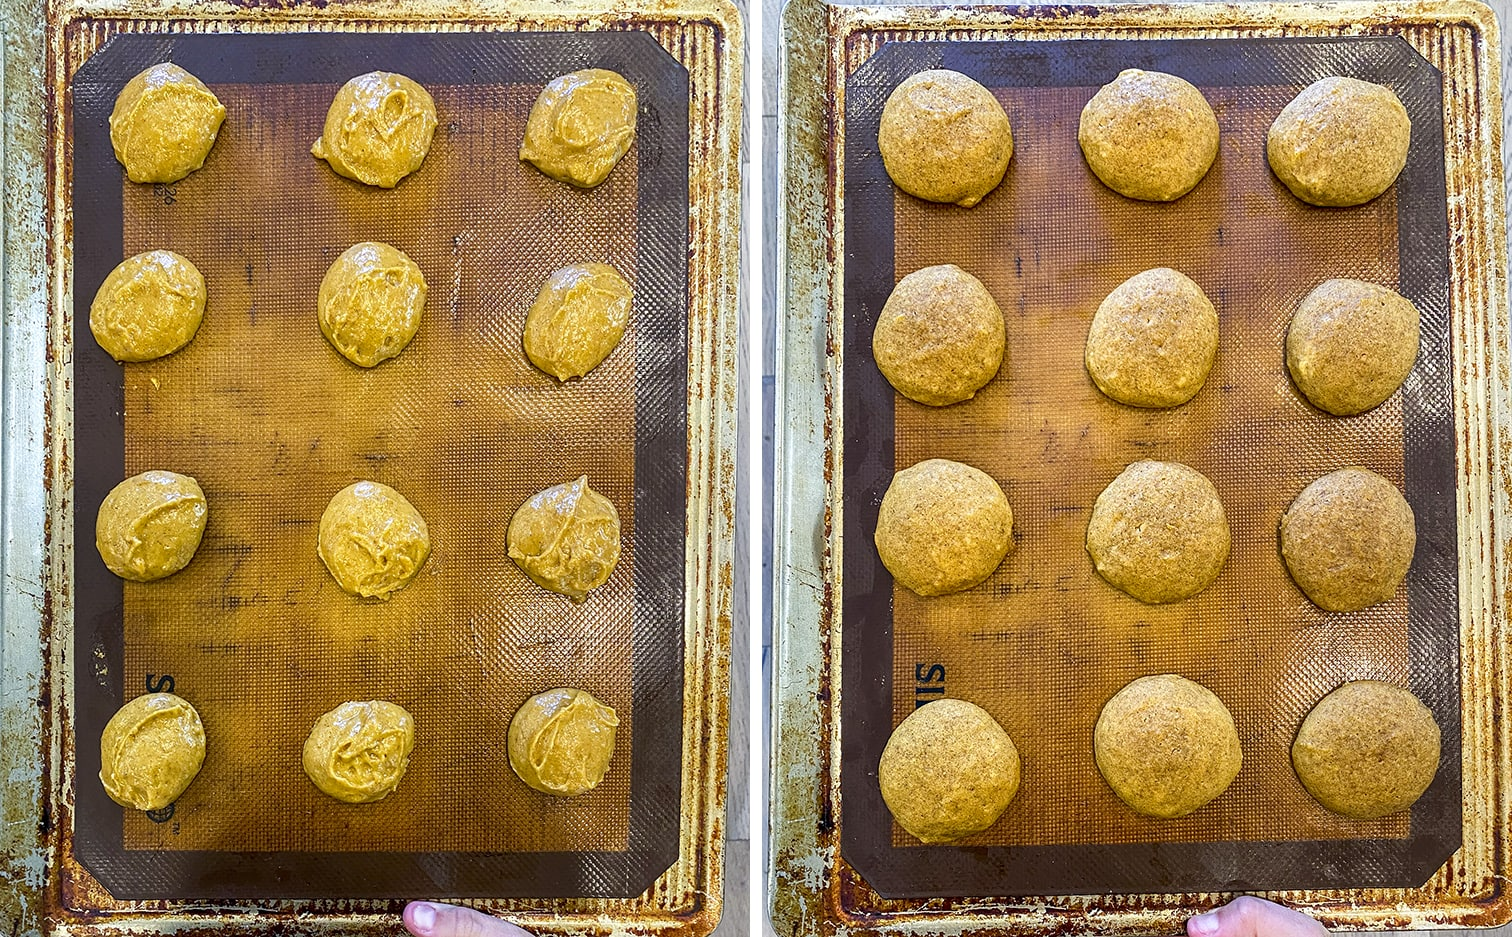 A pan of pumpkin whoopie pie dough. Then a pan of the pumpkin whoopie pies baked.